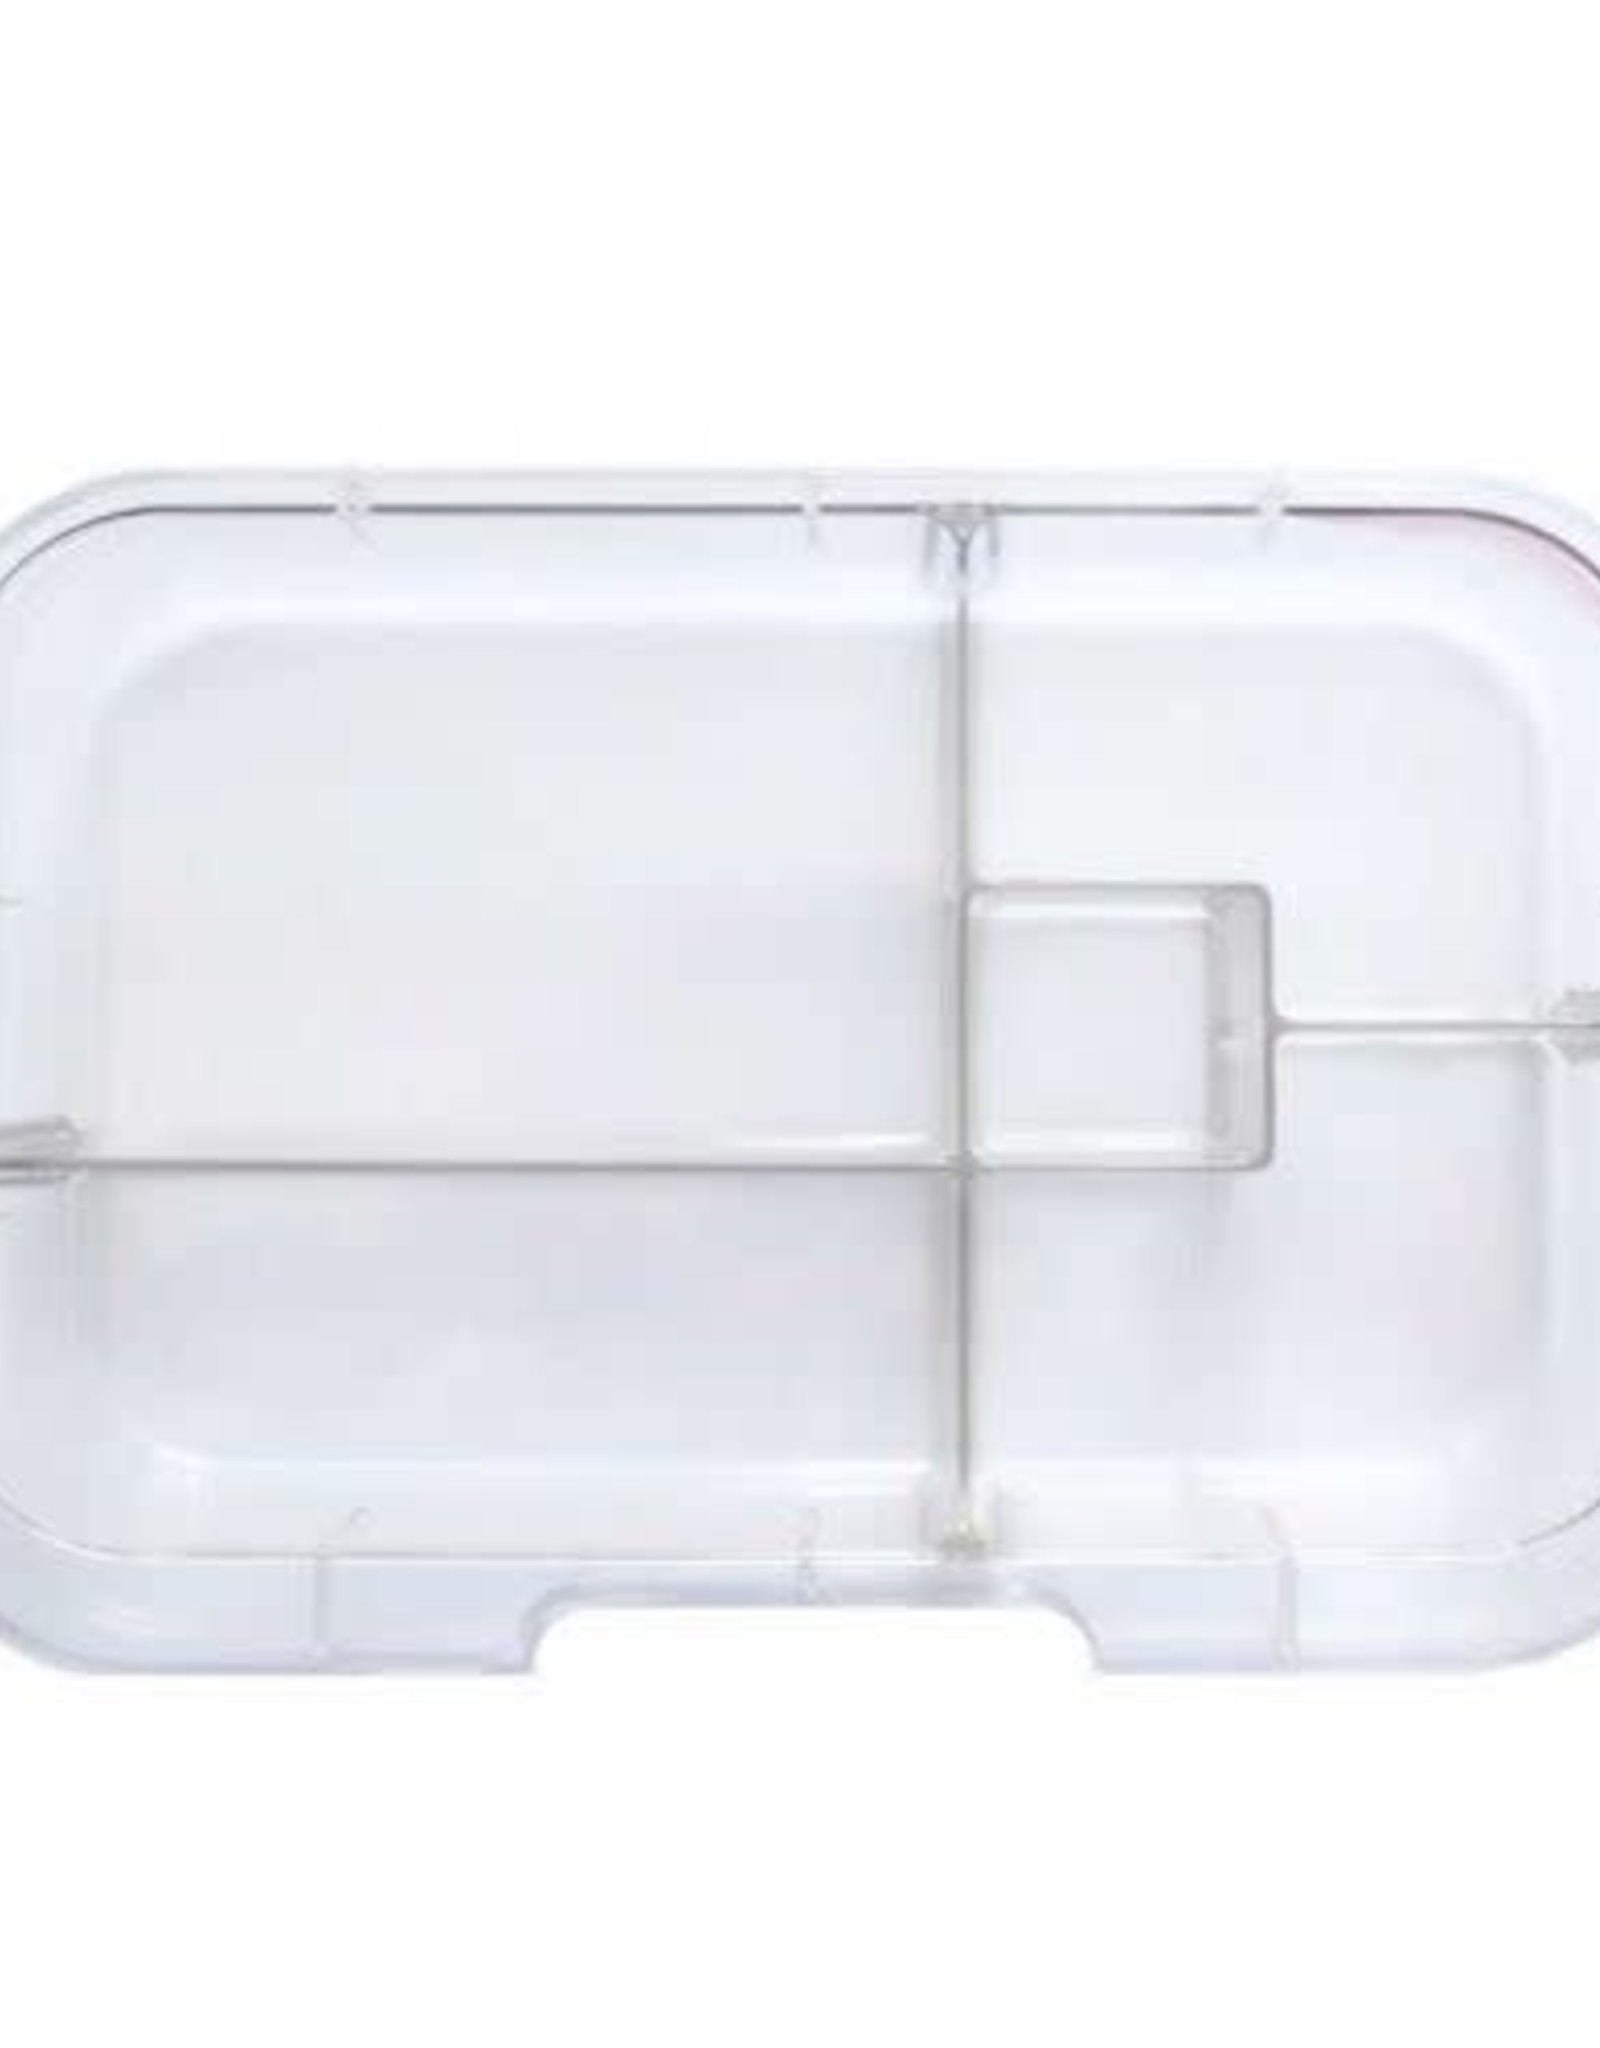 Munchbox Munchbox Bento Midi 5 - Clear Tray